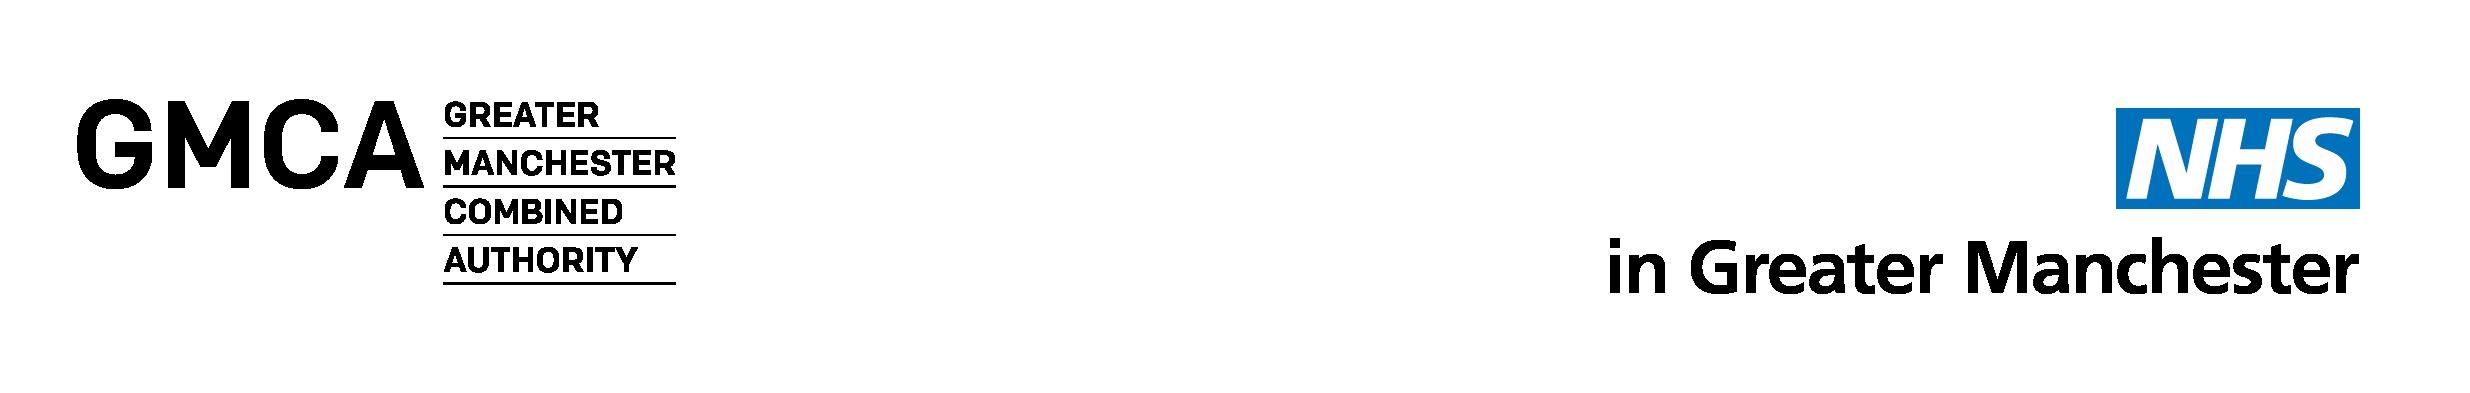 New NHS GM Logo_GMCA & GM NHS - Copy-1